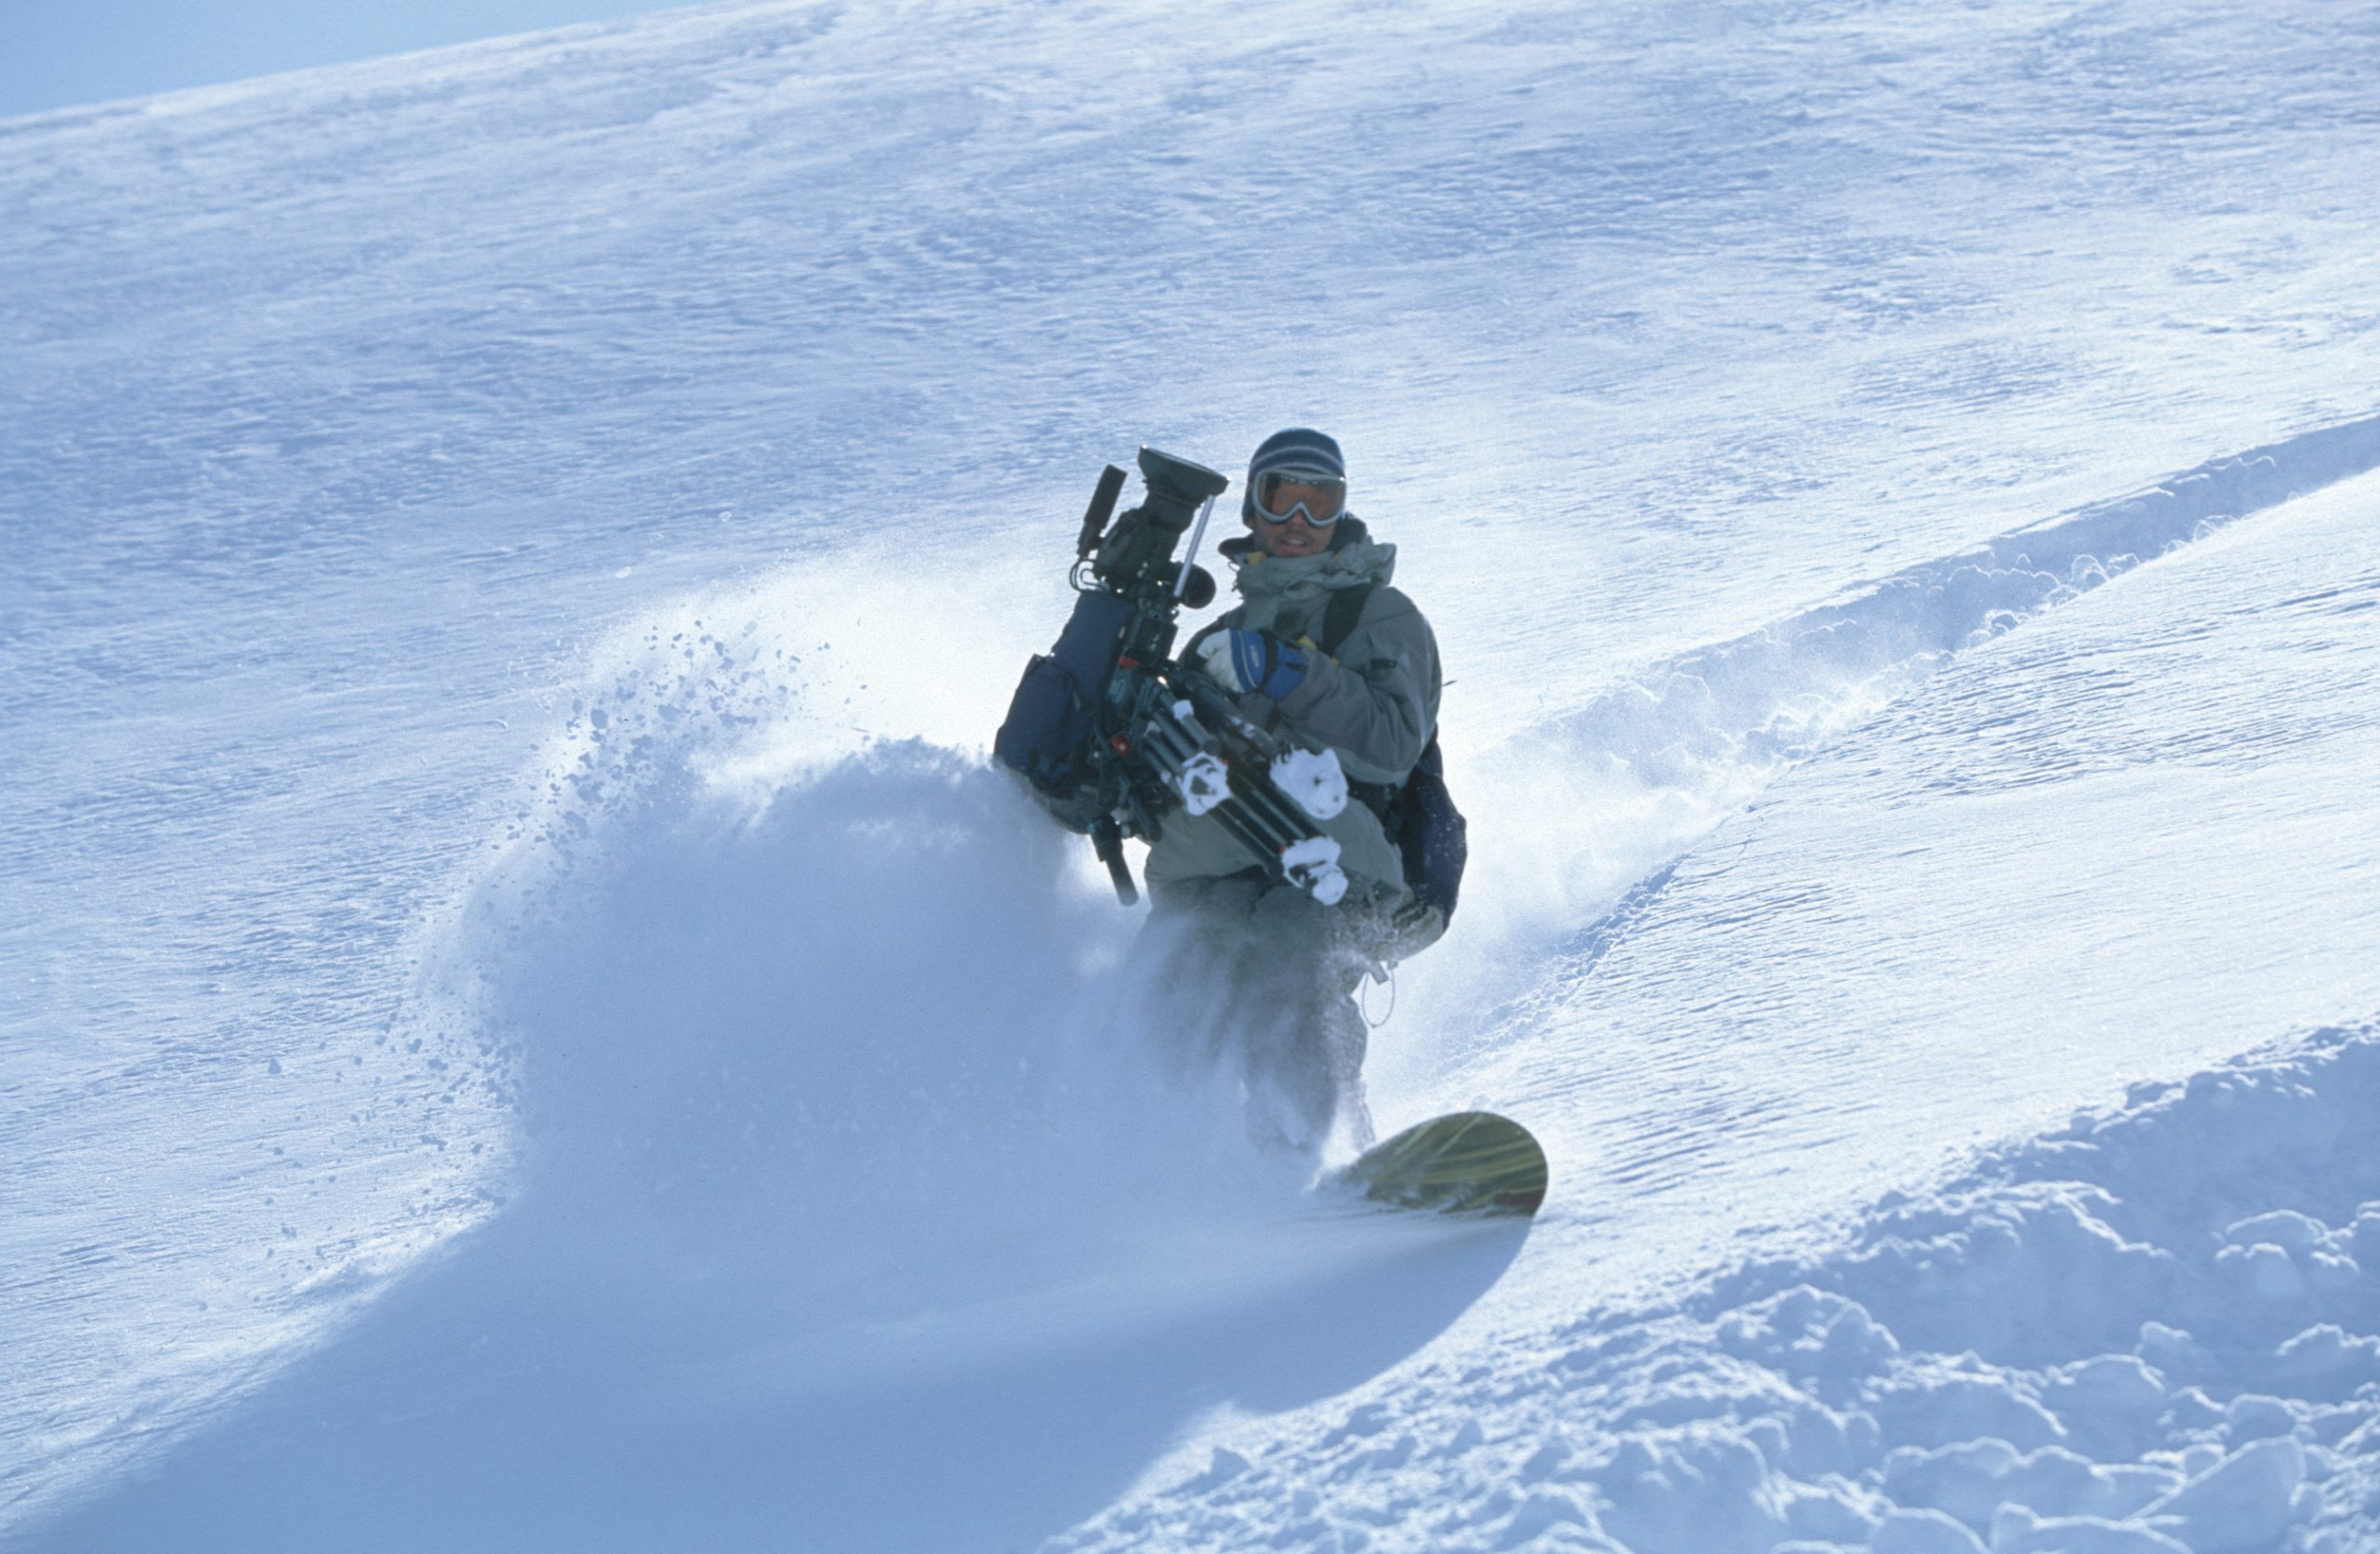 Tim Butt Cameraman snowboarding Atlin BC powder backcountry Burton Canyon